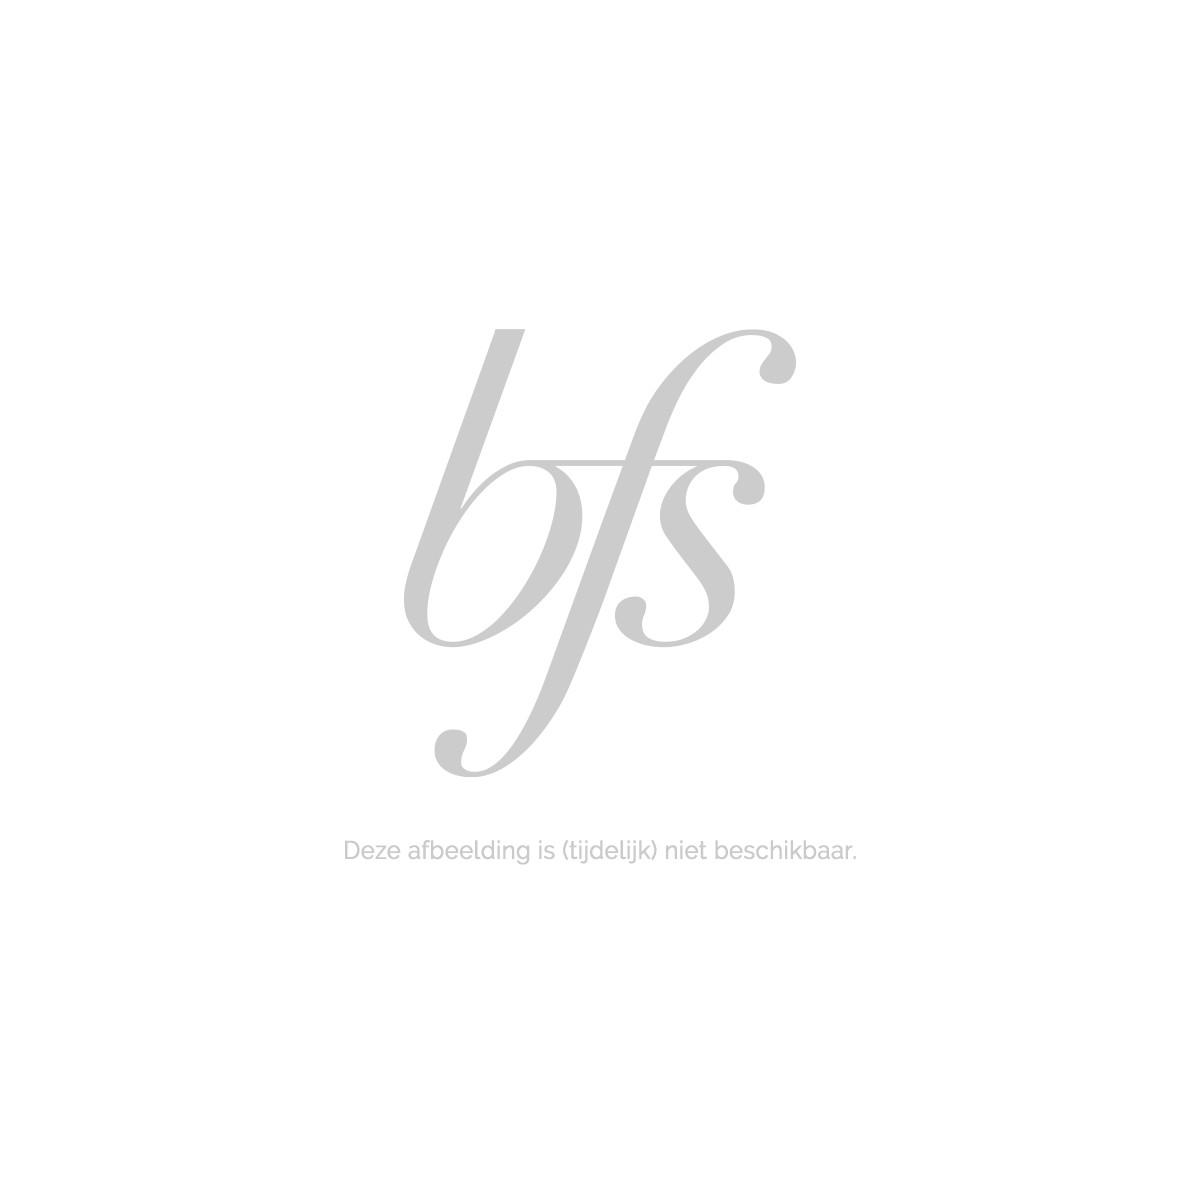 Christian Dior Backstage Brushes Fluid Foundation Brush #11 1 gr